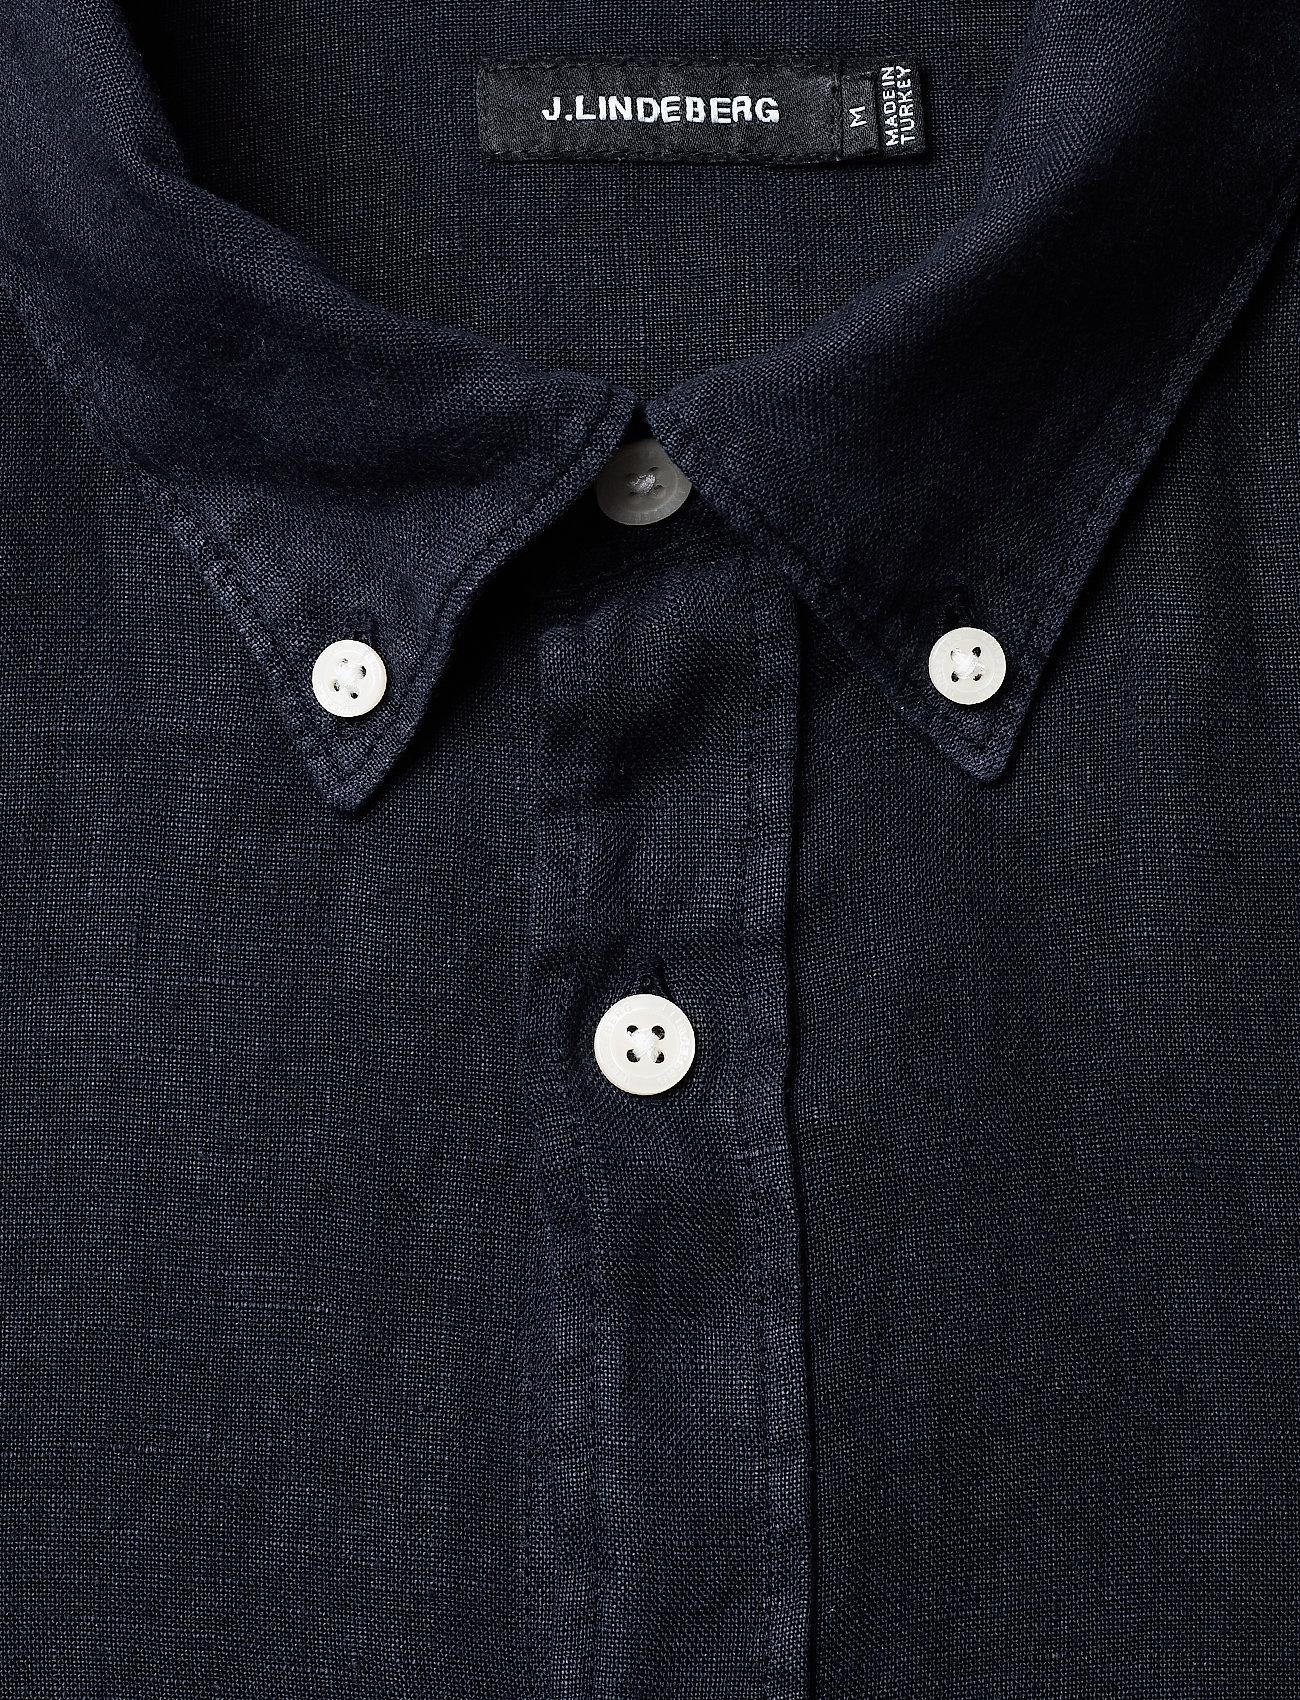 J. Lindeberg - Fredrik BD SS-Clean Linen - chemises basiques - jl navy - 1